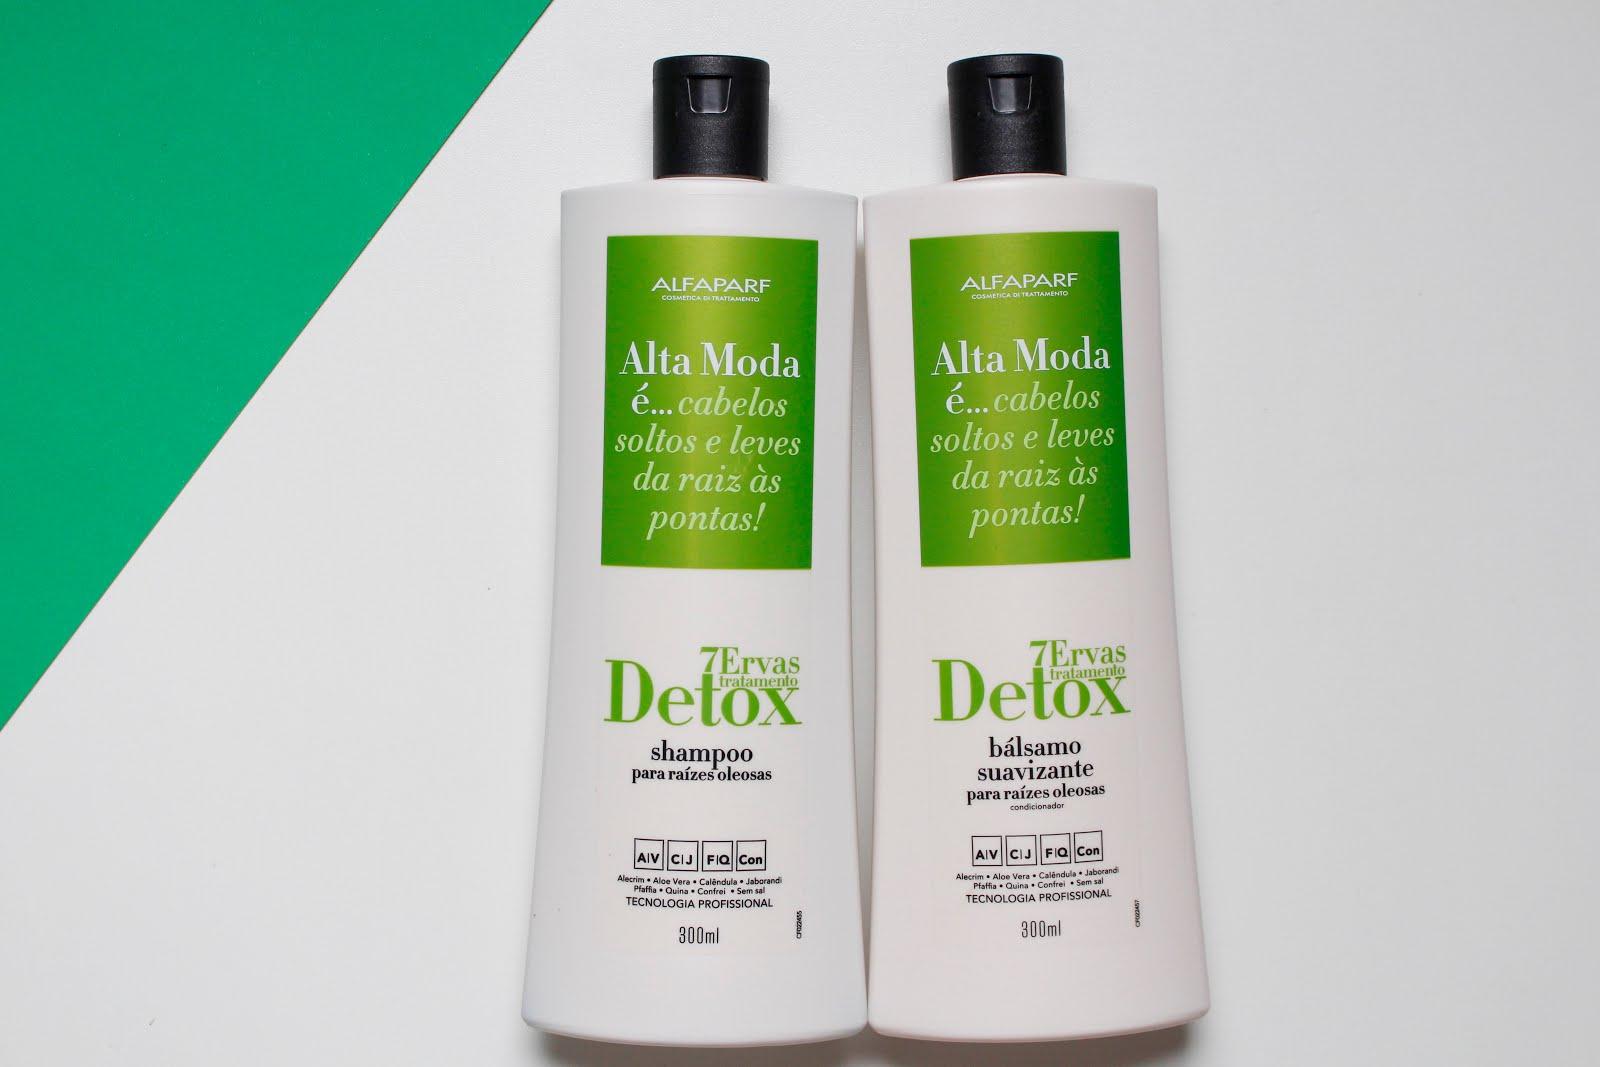 Tratamento Detox 7 ervas da Alfaparf - Blog Cris Felix